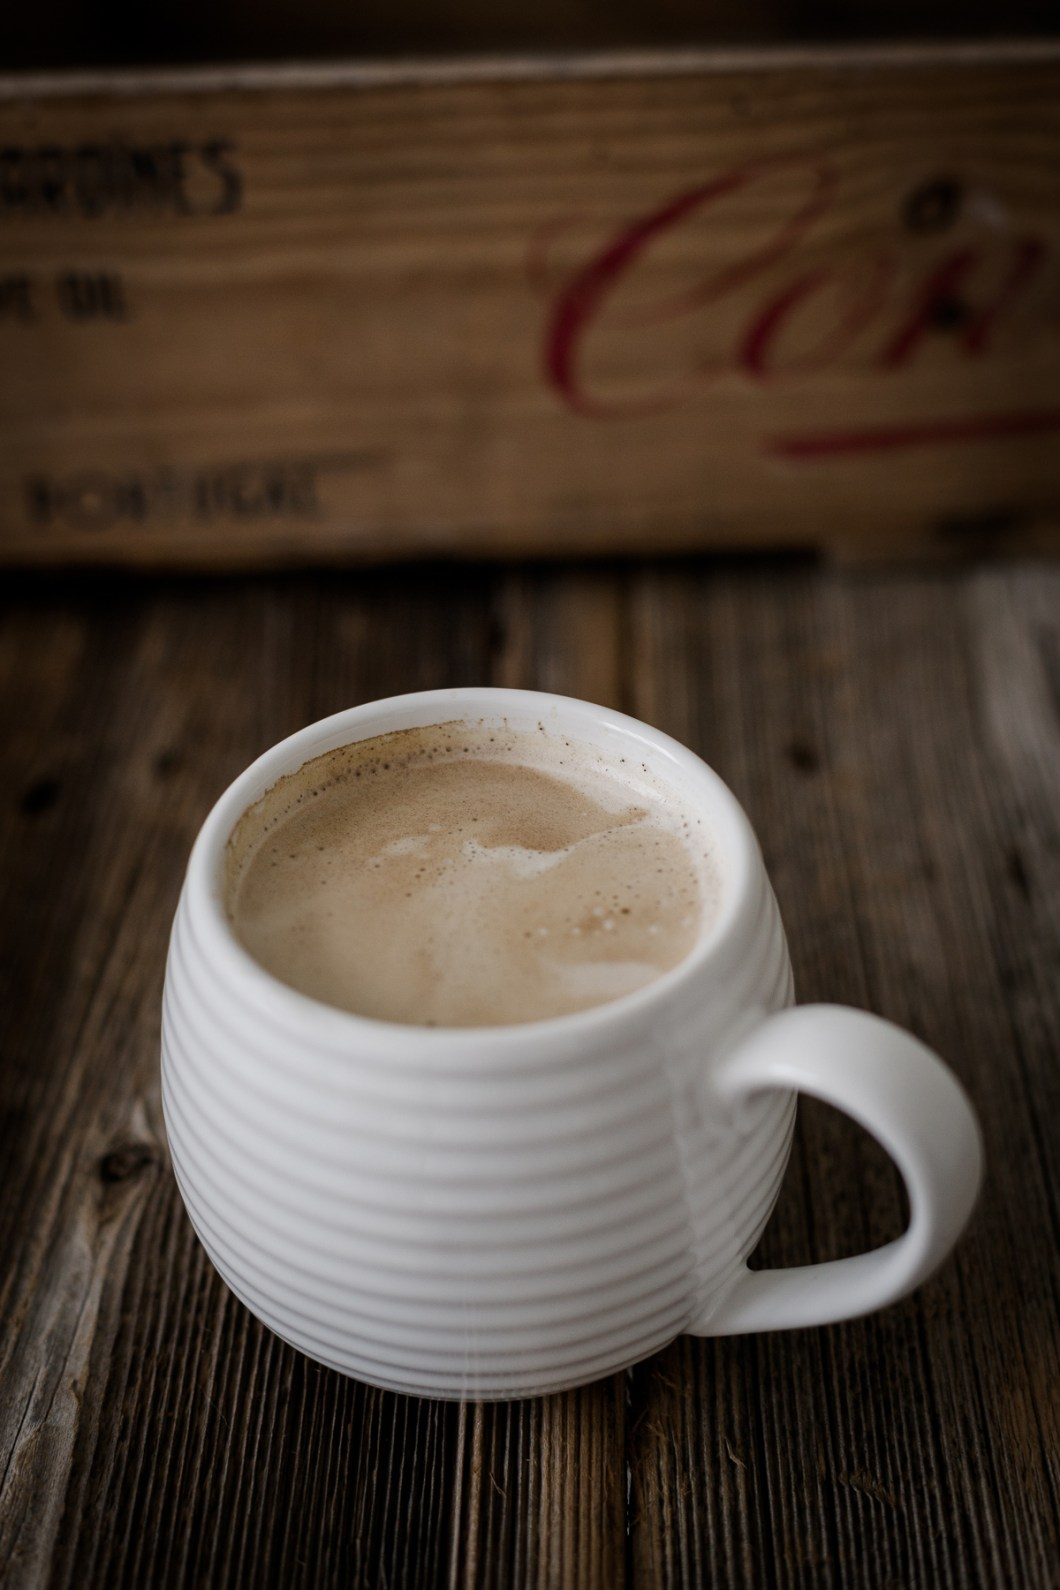 Foodfotografie von nordbrise.net Foodblog & Foodfotografie | Tchibo Eduscho Cafissimo Caffe Crema XL